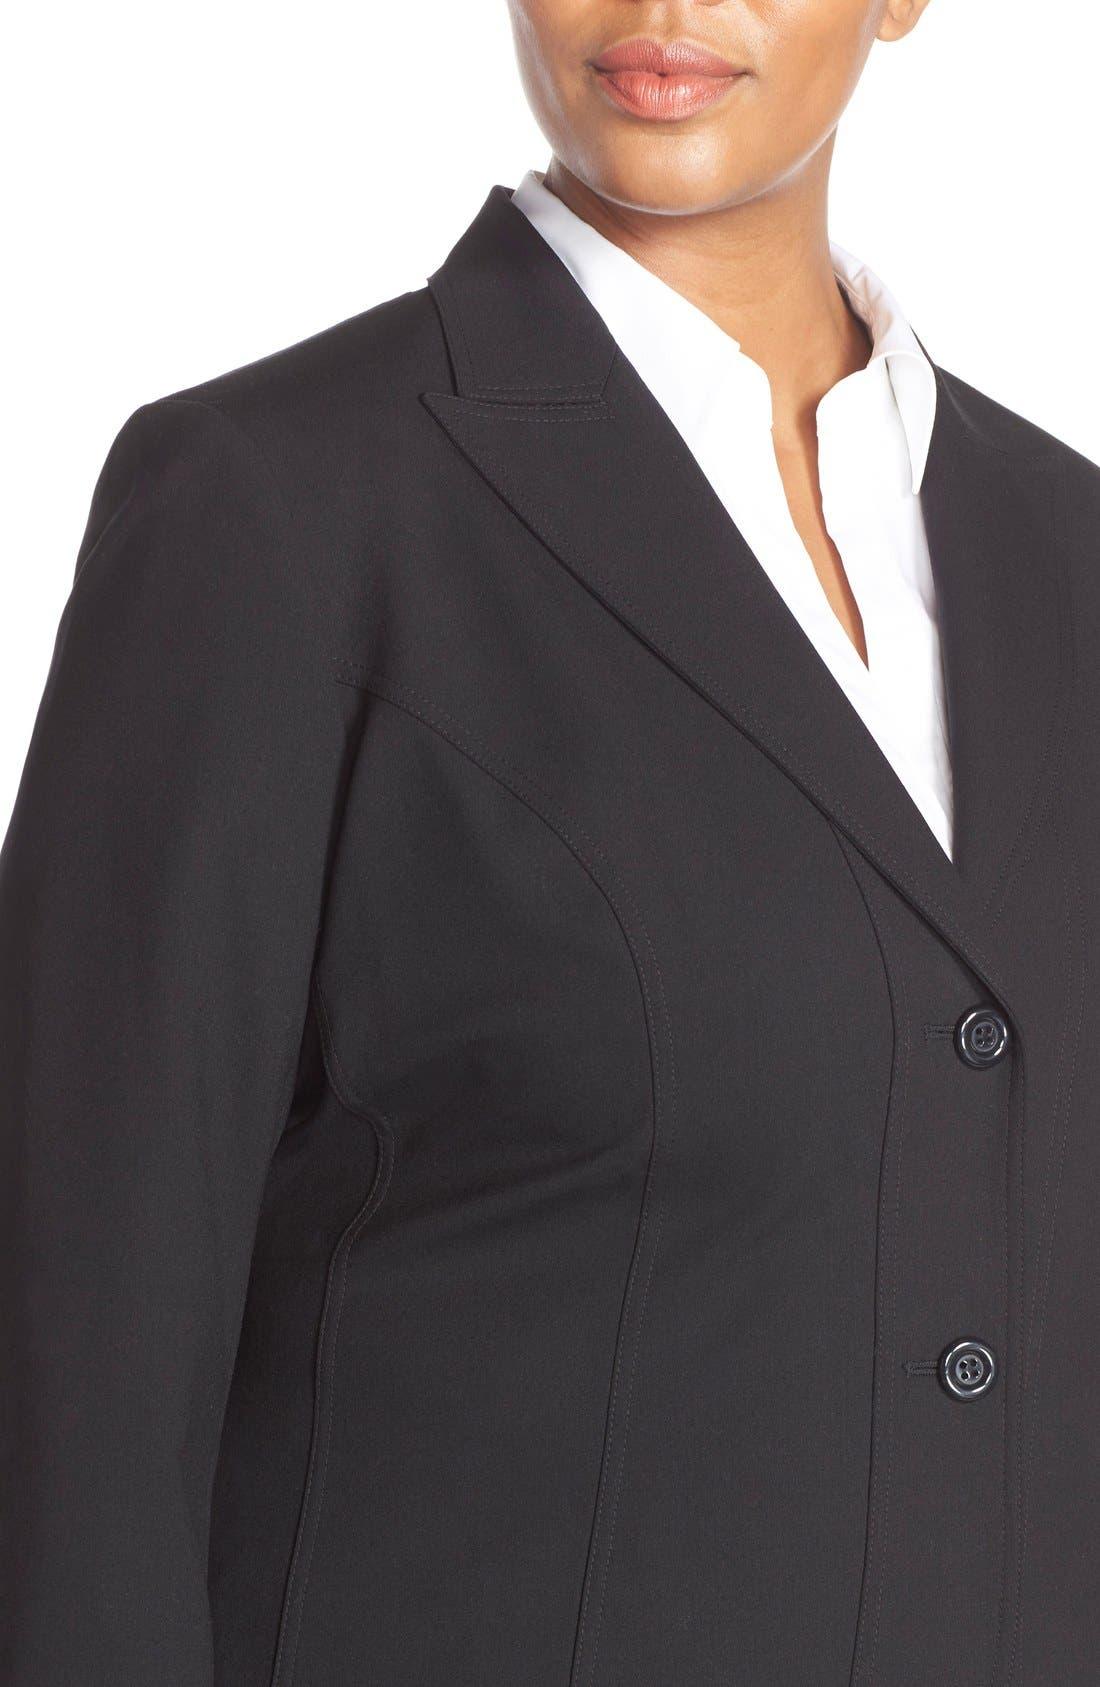 'Gladstone' Stretch Wool Jacket,                             Alternate thumbnail 3, color,                             Black